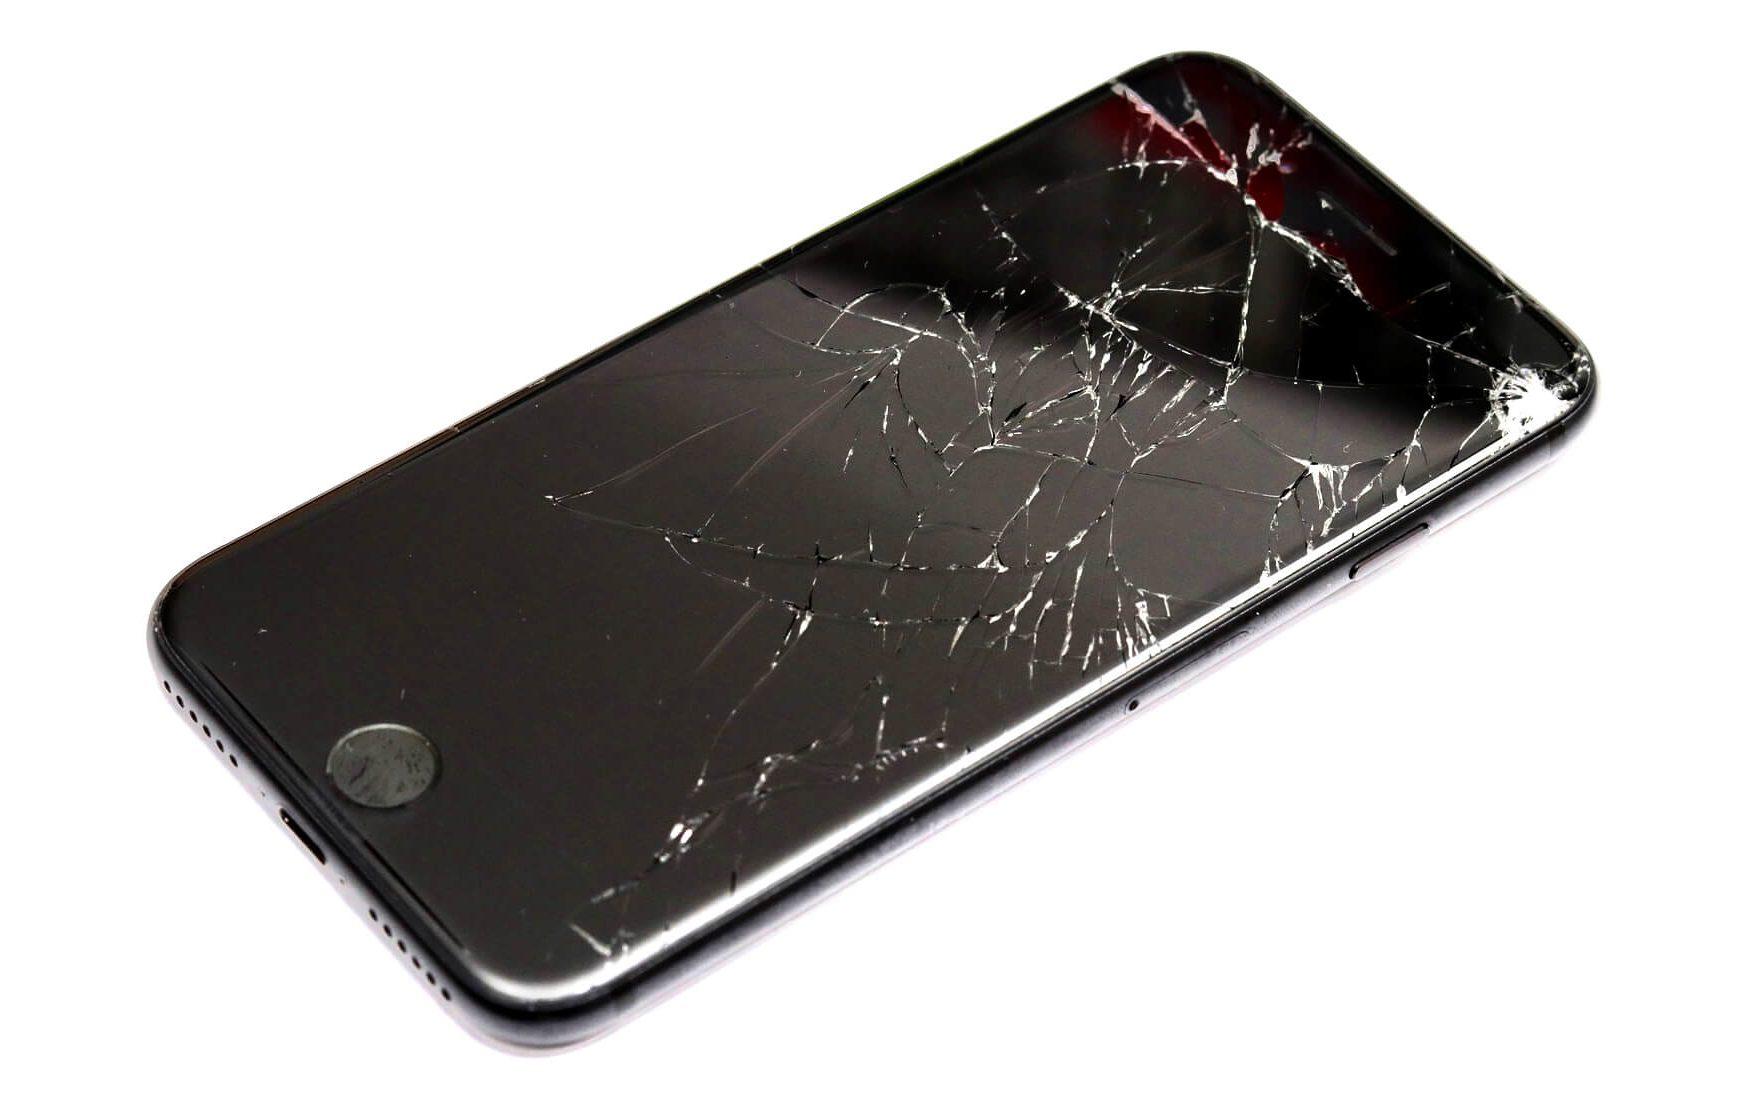 pantalla movil rota iphone android